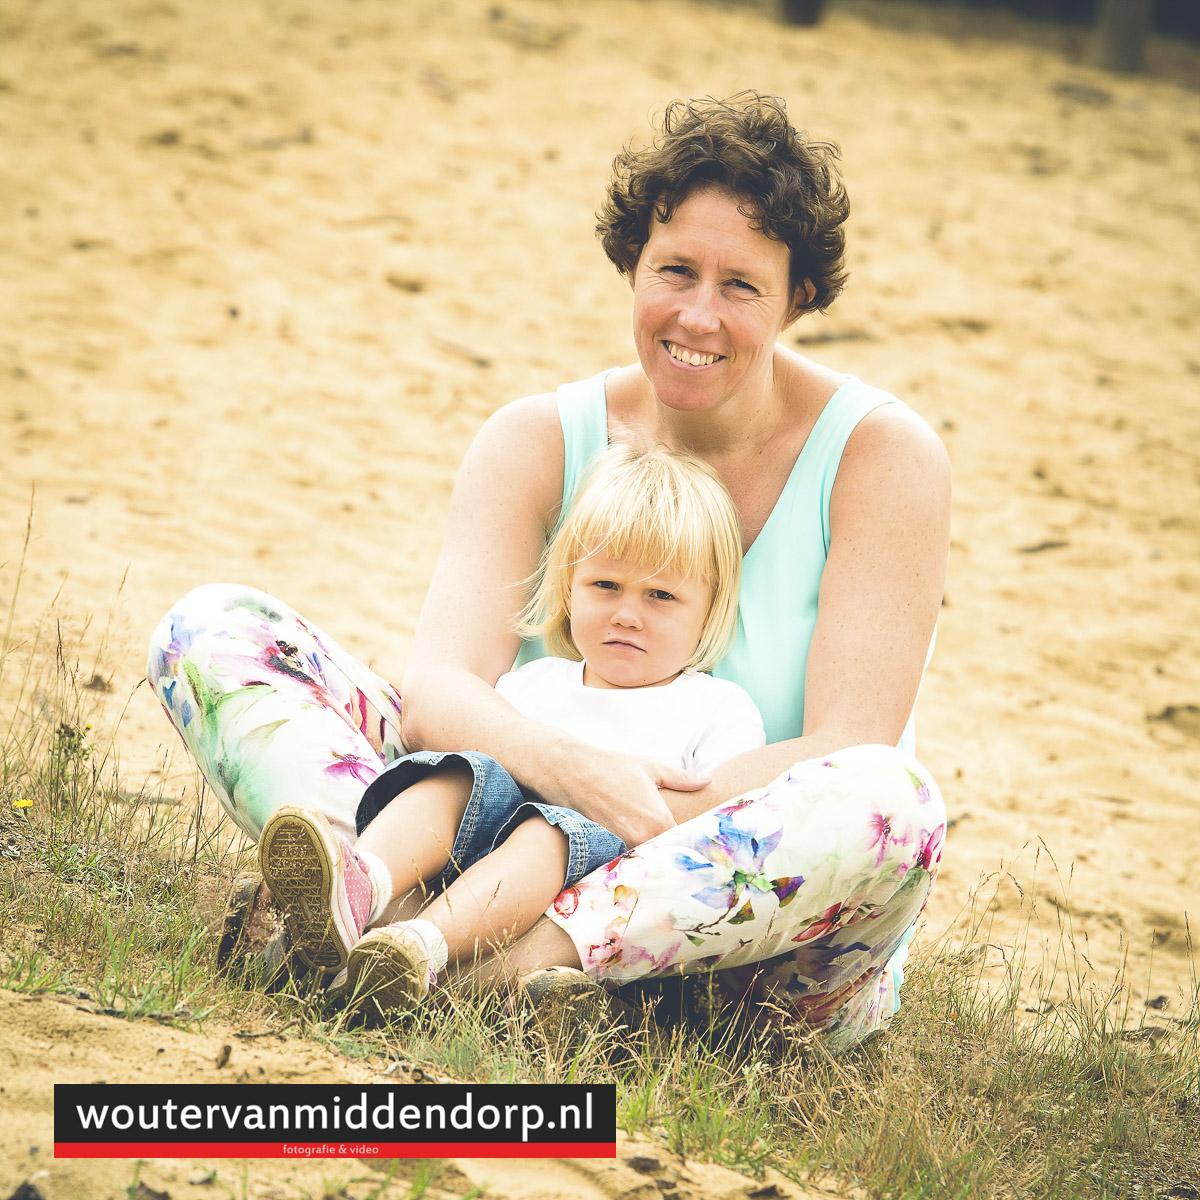 fotografie Wouter van Middendorp, Veluwe omgeving Uddel, Nunspeet, Barneveld, Putten, Landal Rabbit Hill (8)